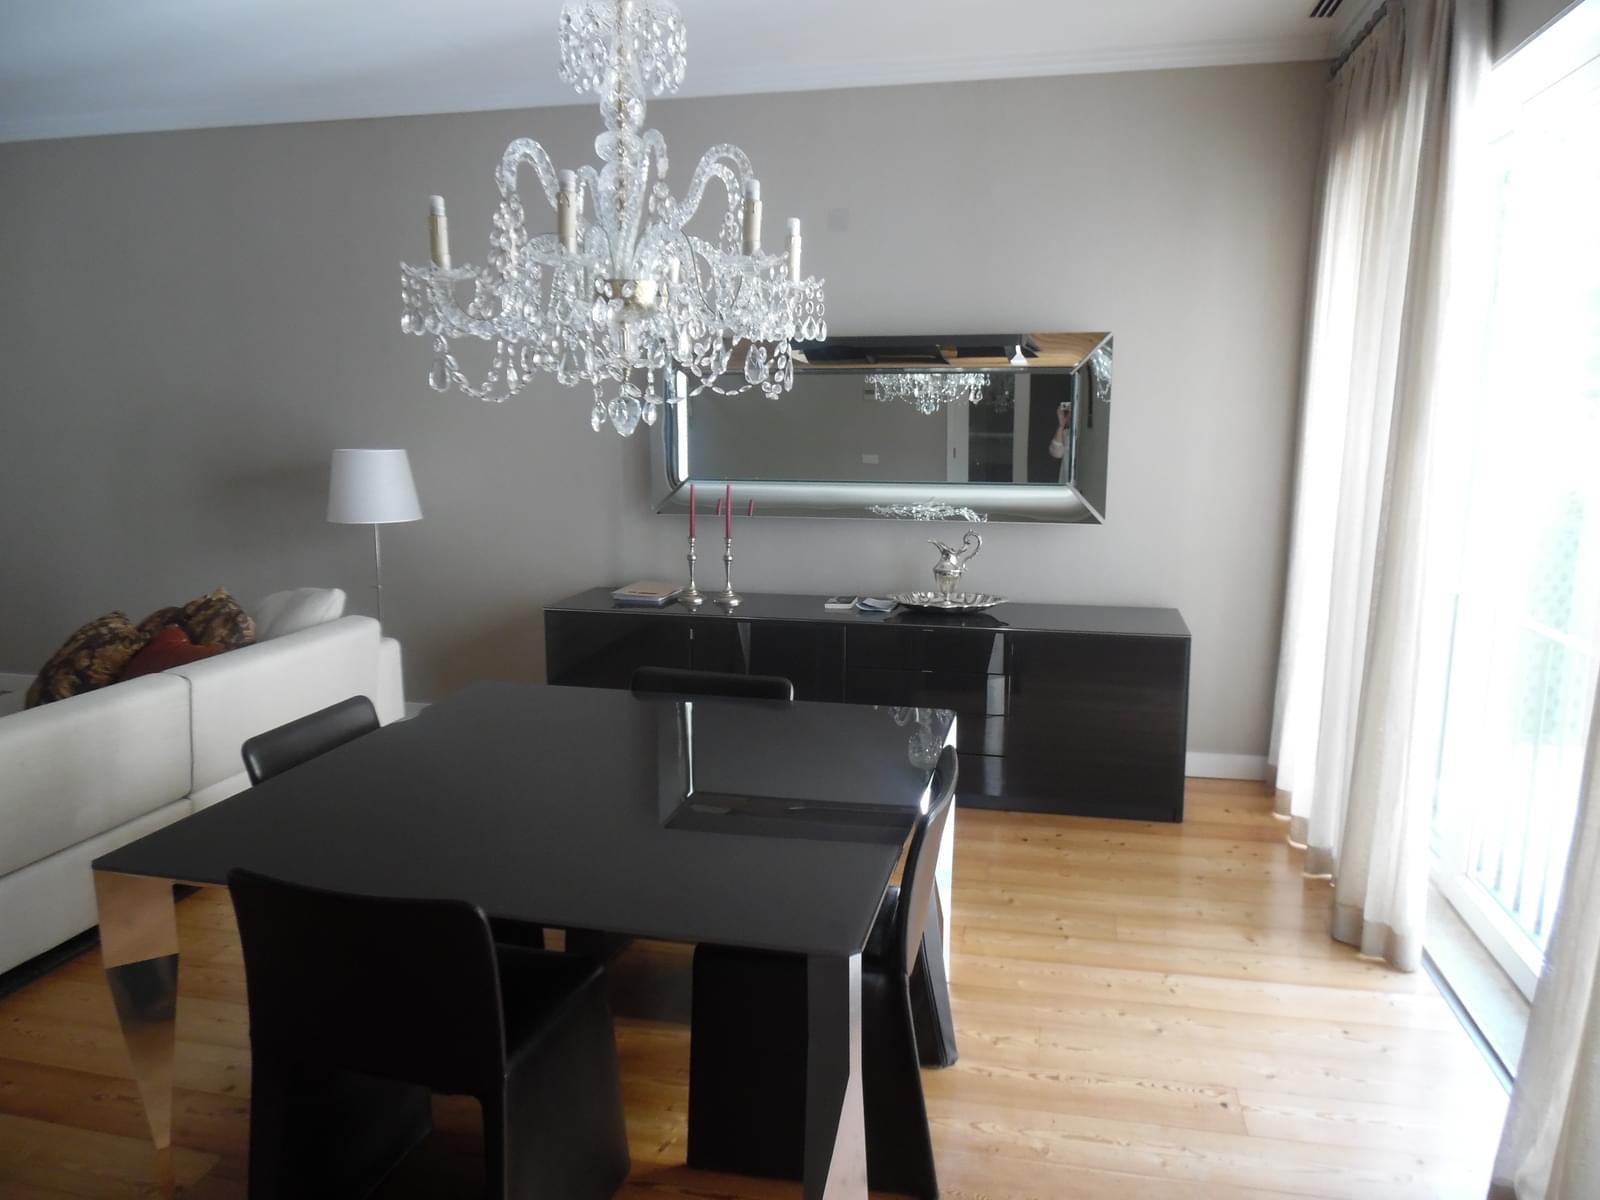 pf17454-apartamento-t4-lisboa-ca6555ba-dea1-4833-89f0-c7768e59e667